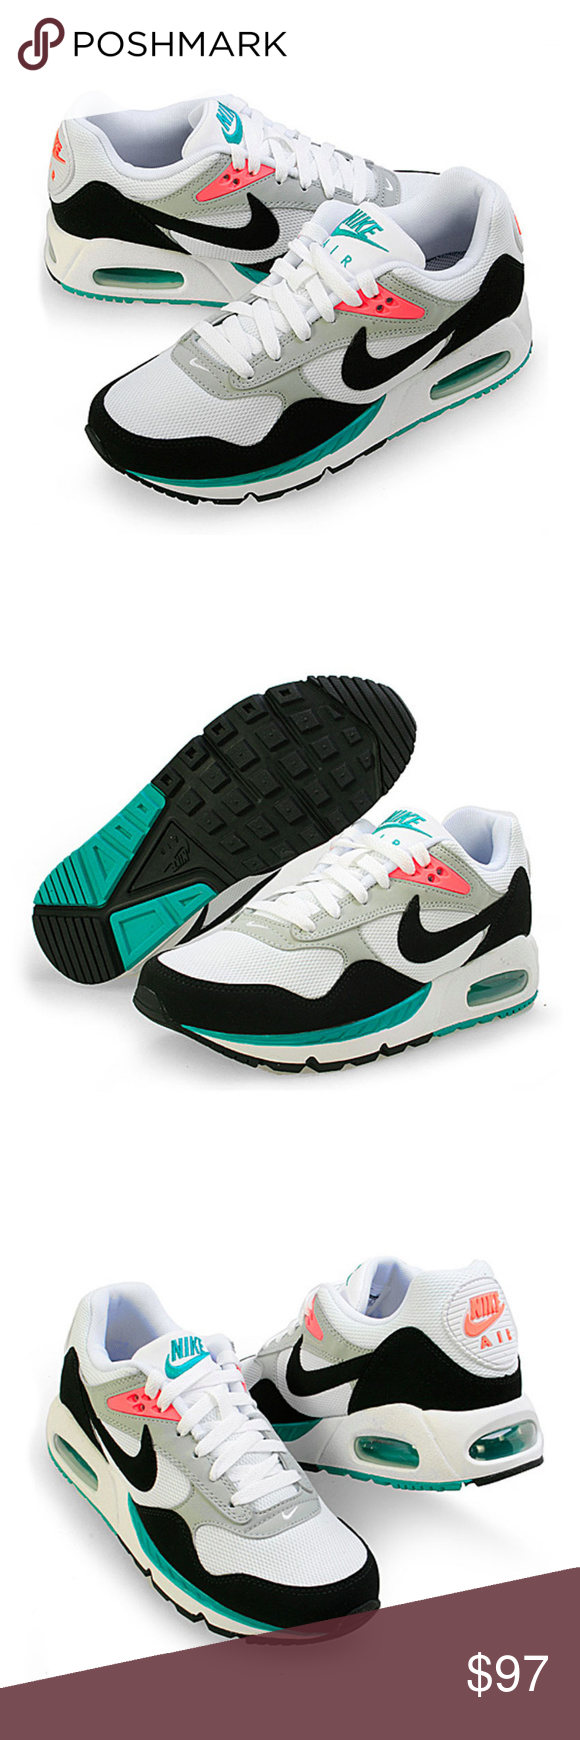 Nike Air Max Correlate WhiteBlackGreenMango WM Nike Air